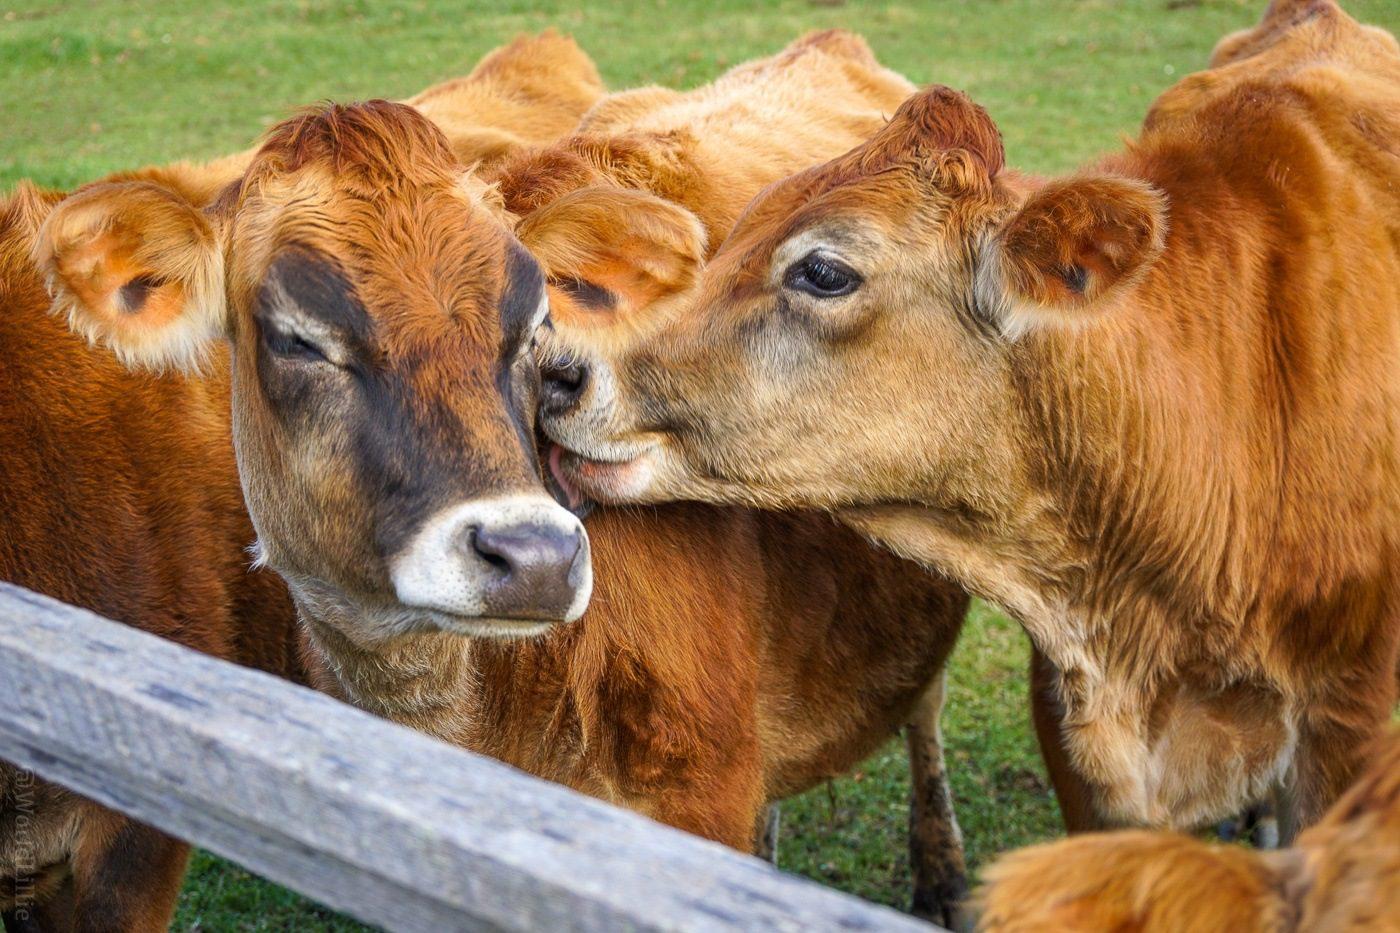 Kissing cows at Billings Farm, Woodstock, Vermont.